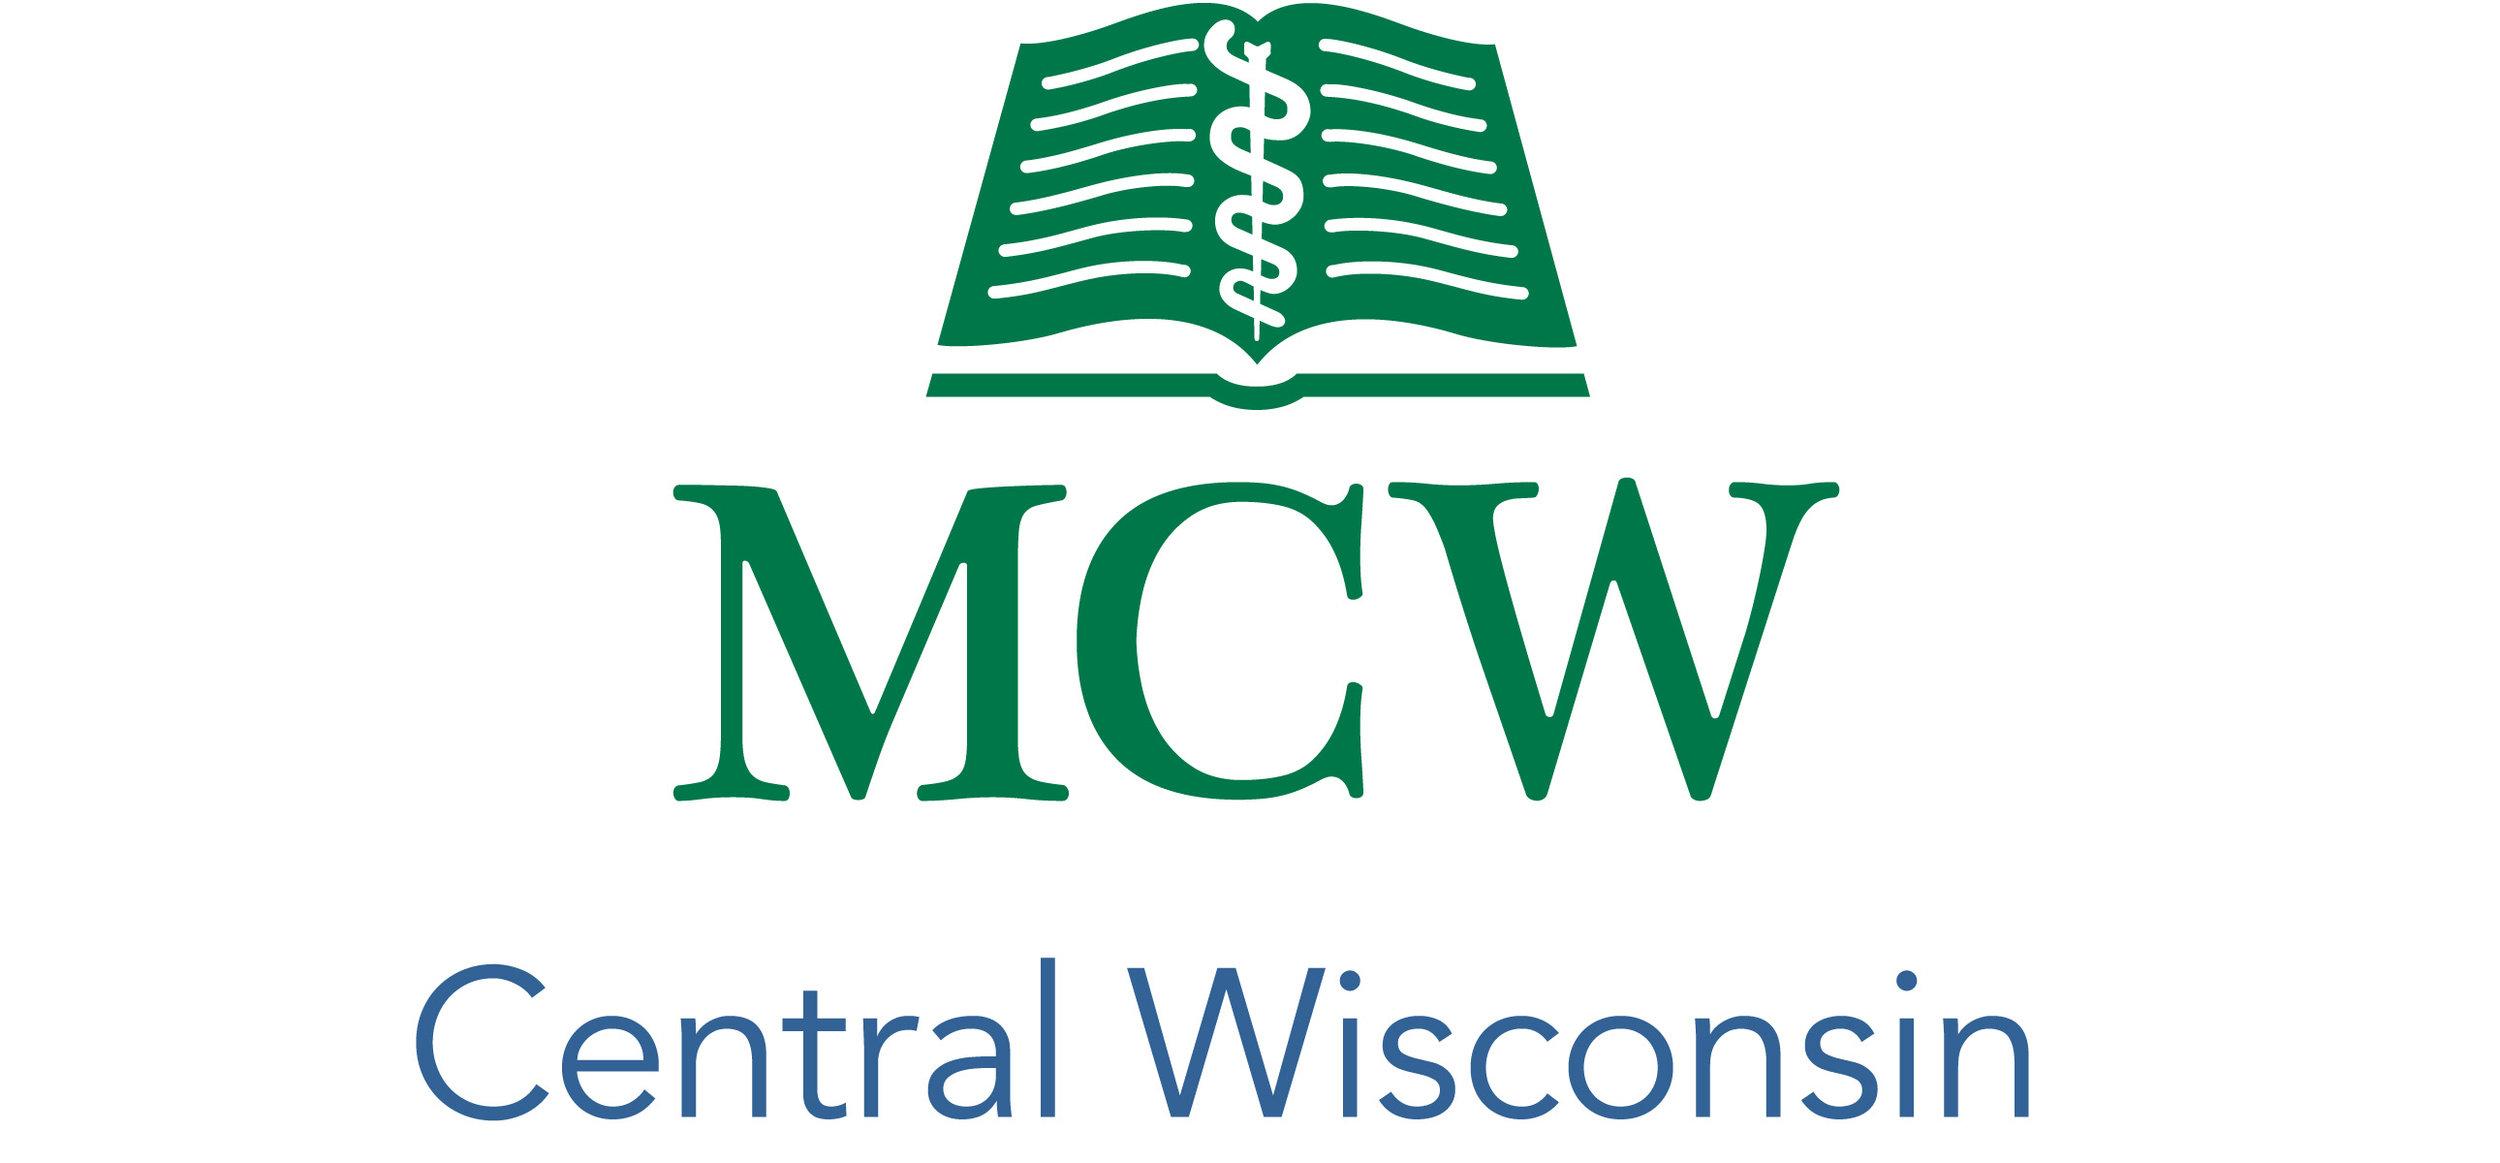 MCW-centralwisconsin-rgb lg high res 1.jpg